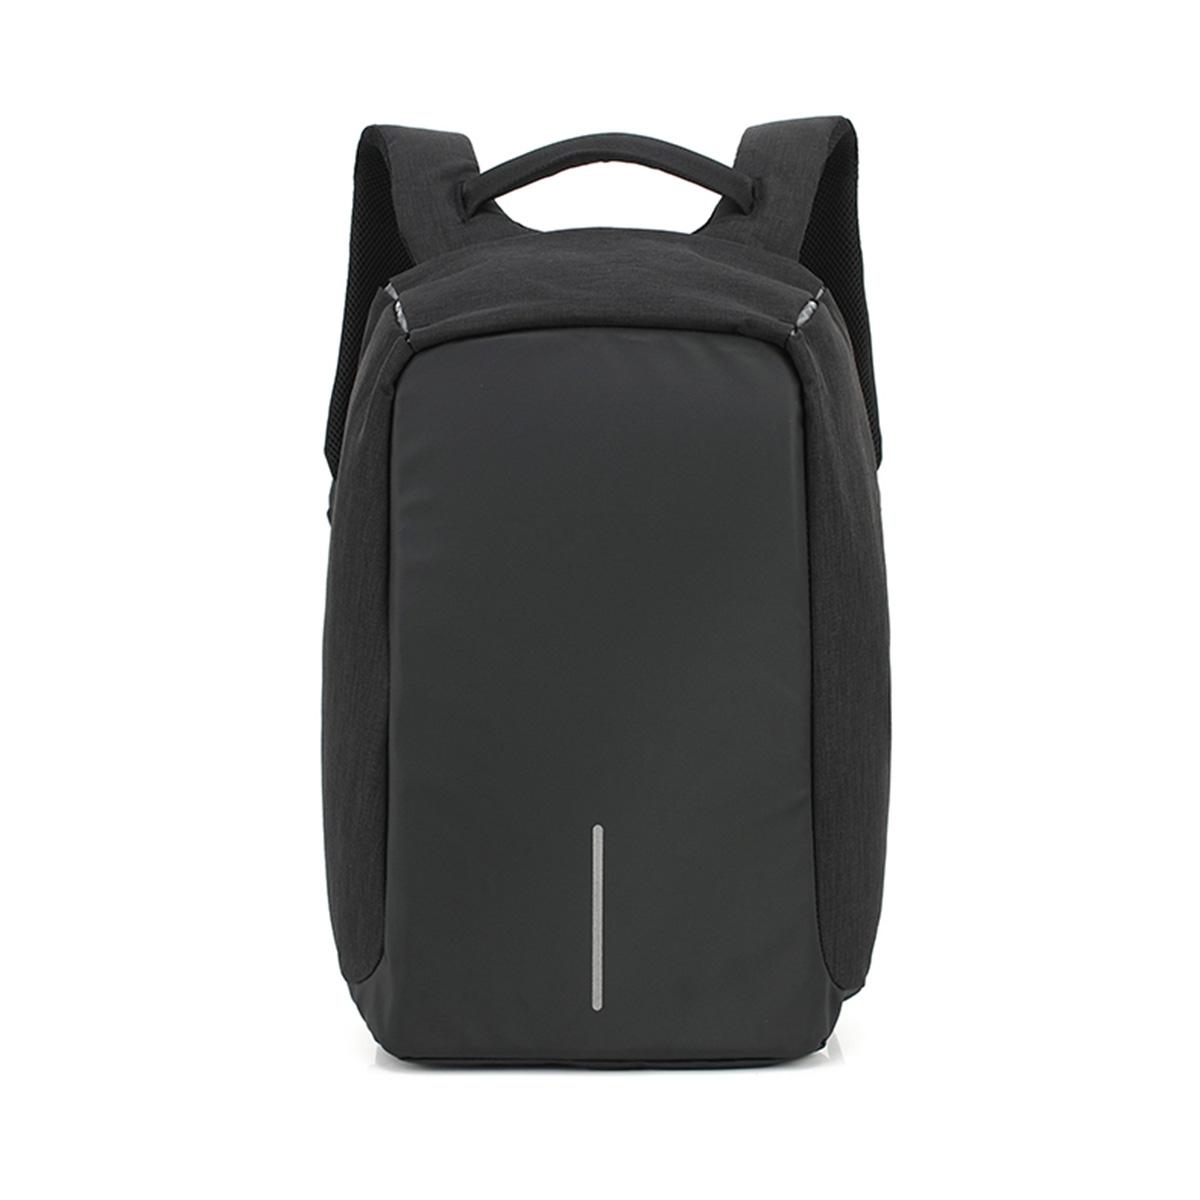 f3be6f506e Σακίδιο Πλάτης Αντικλεπτικό Ozuko Anti Theft Laptop Backpack 8798 Μαύρο